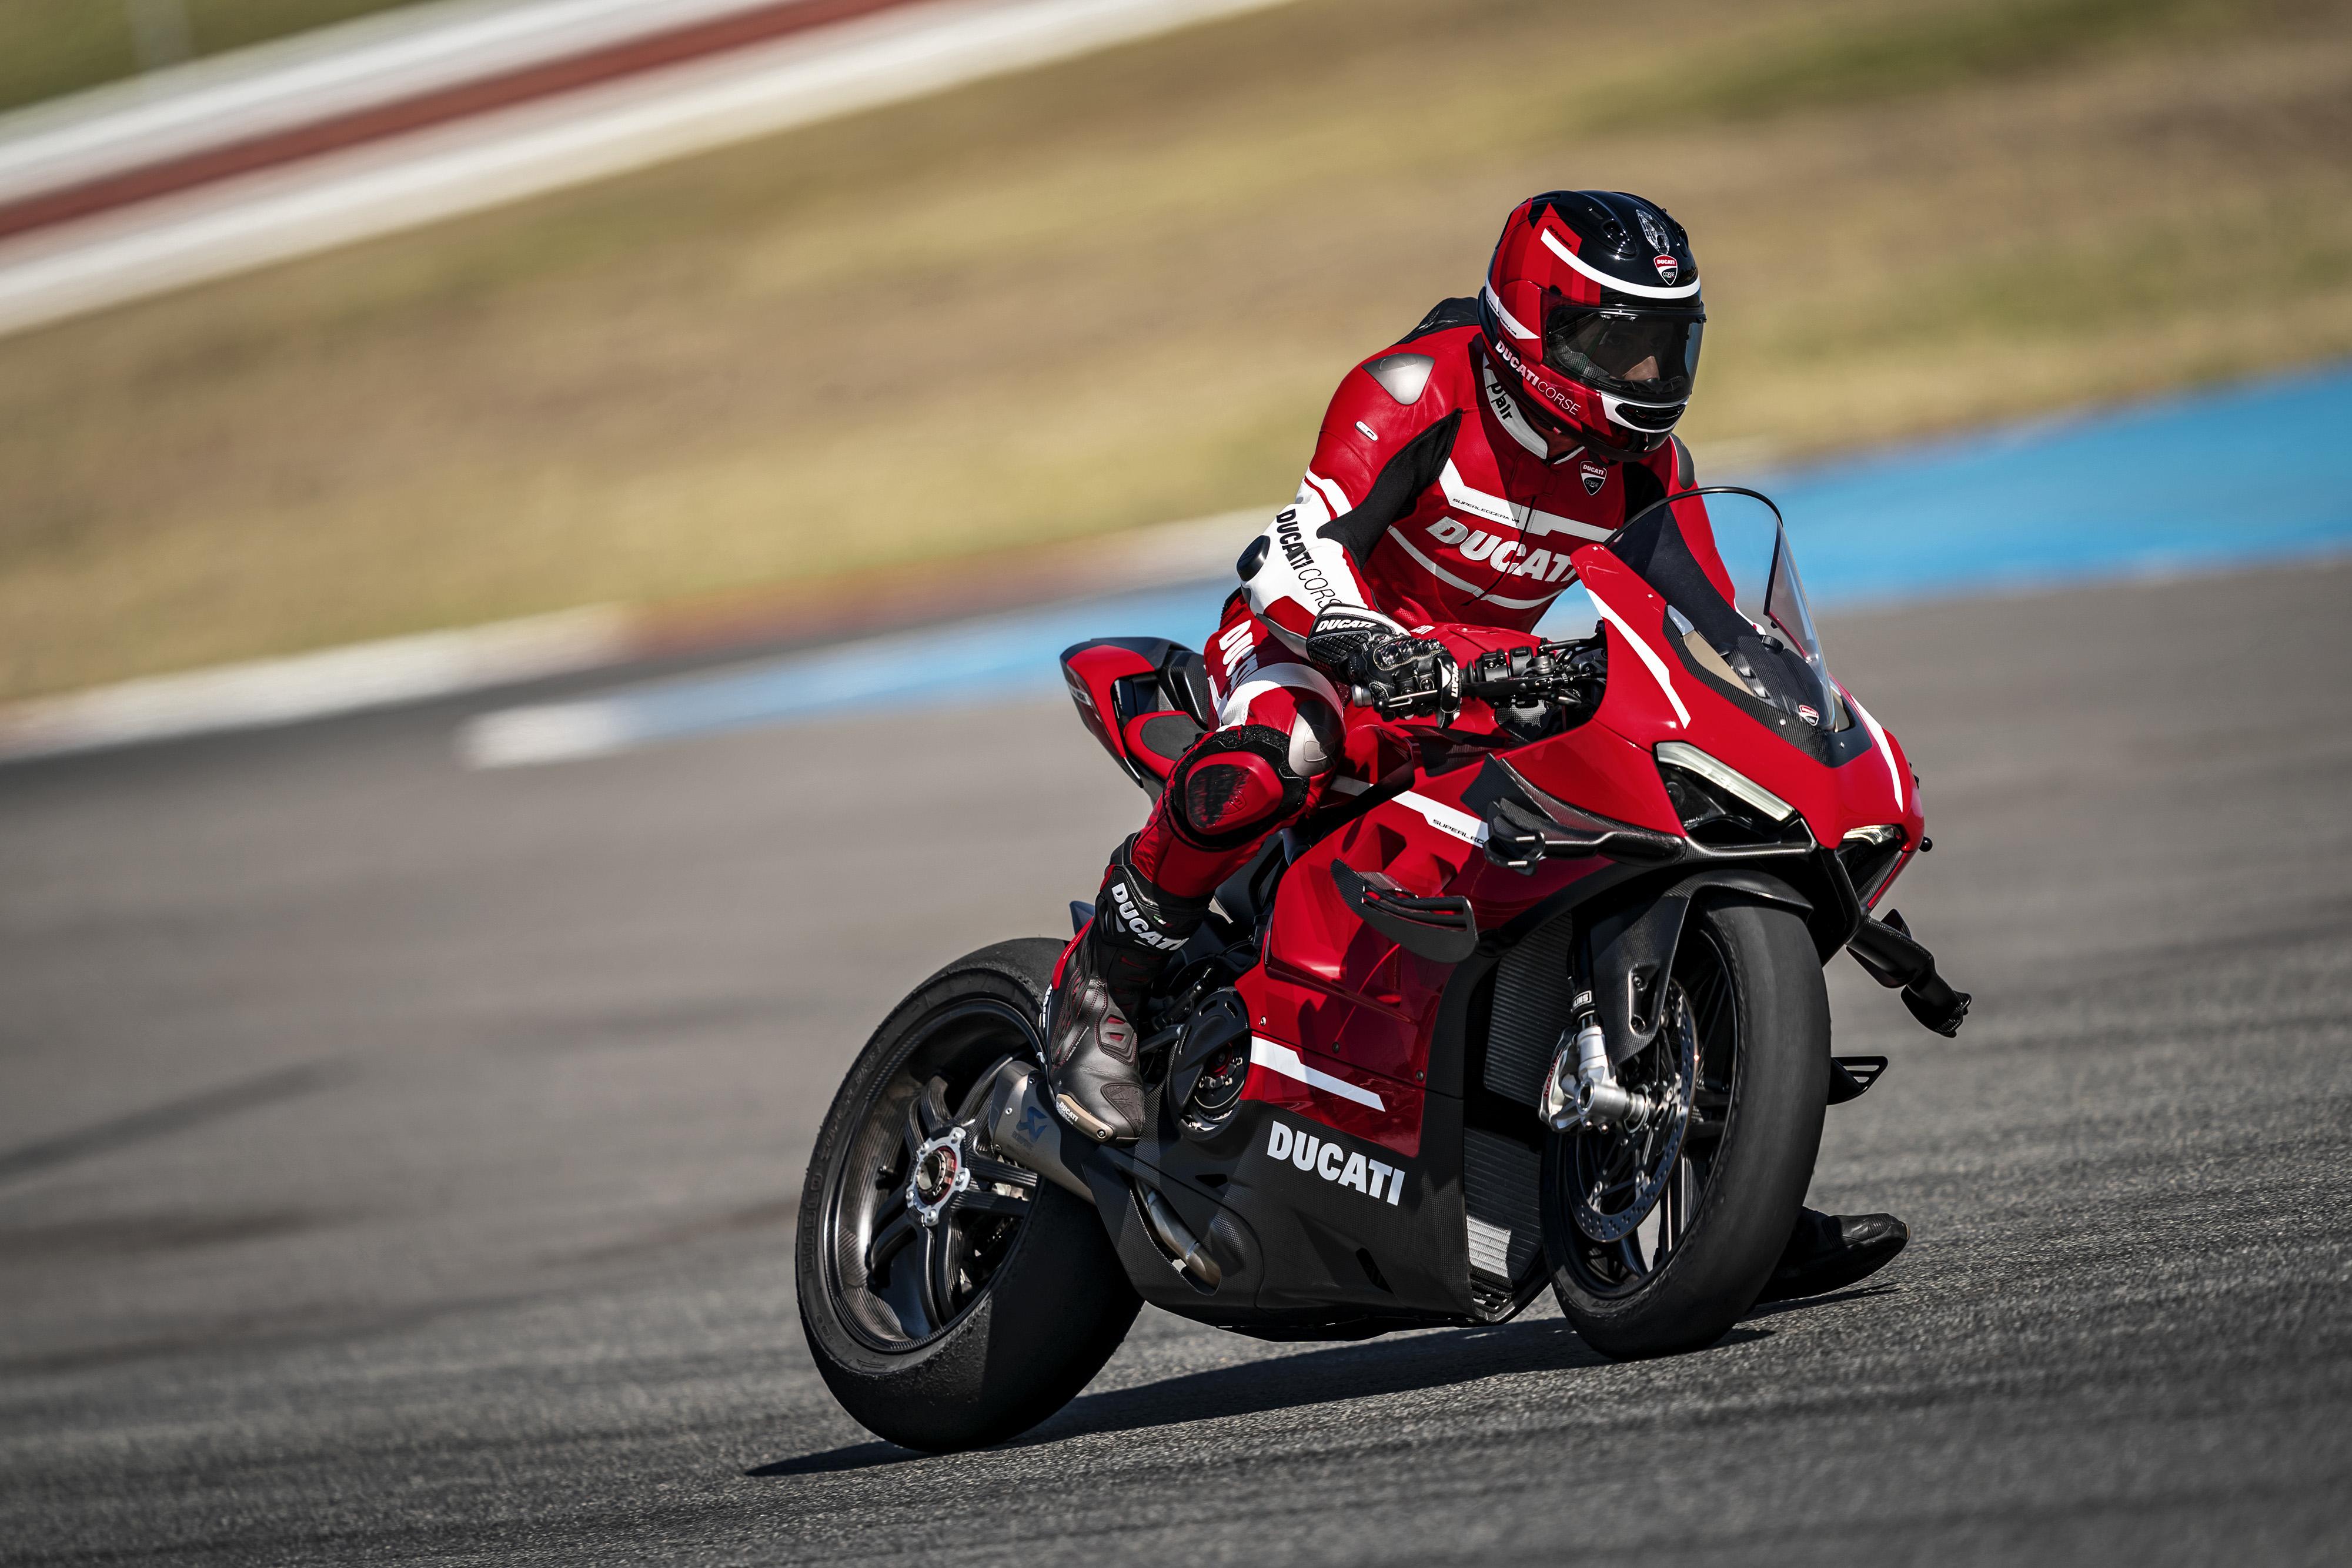 Ducati Superleggera V4, a superdesportiva que custa mais de 100 mil euros